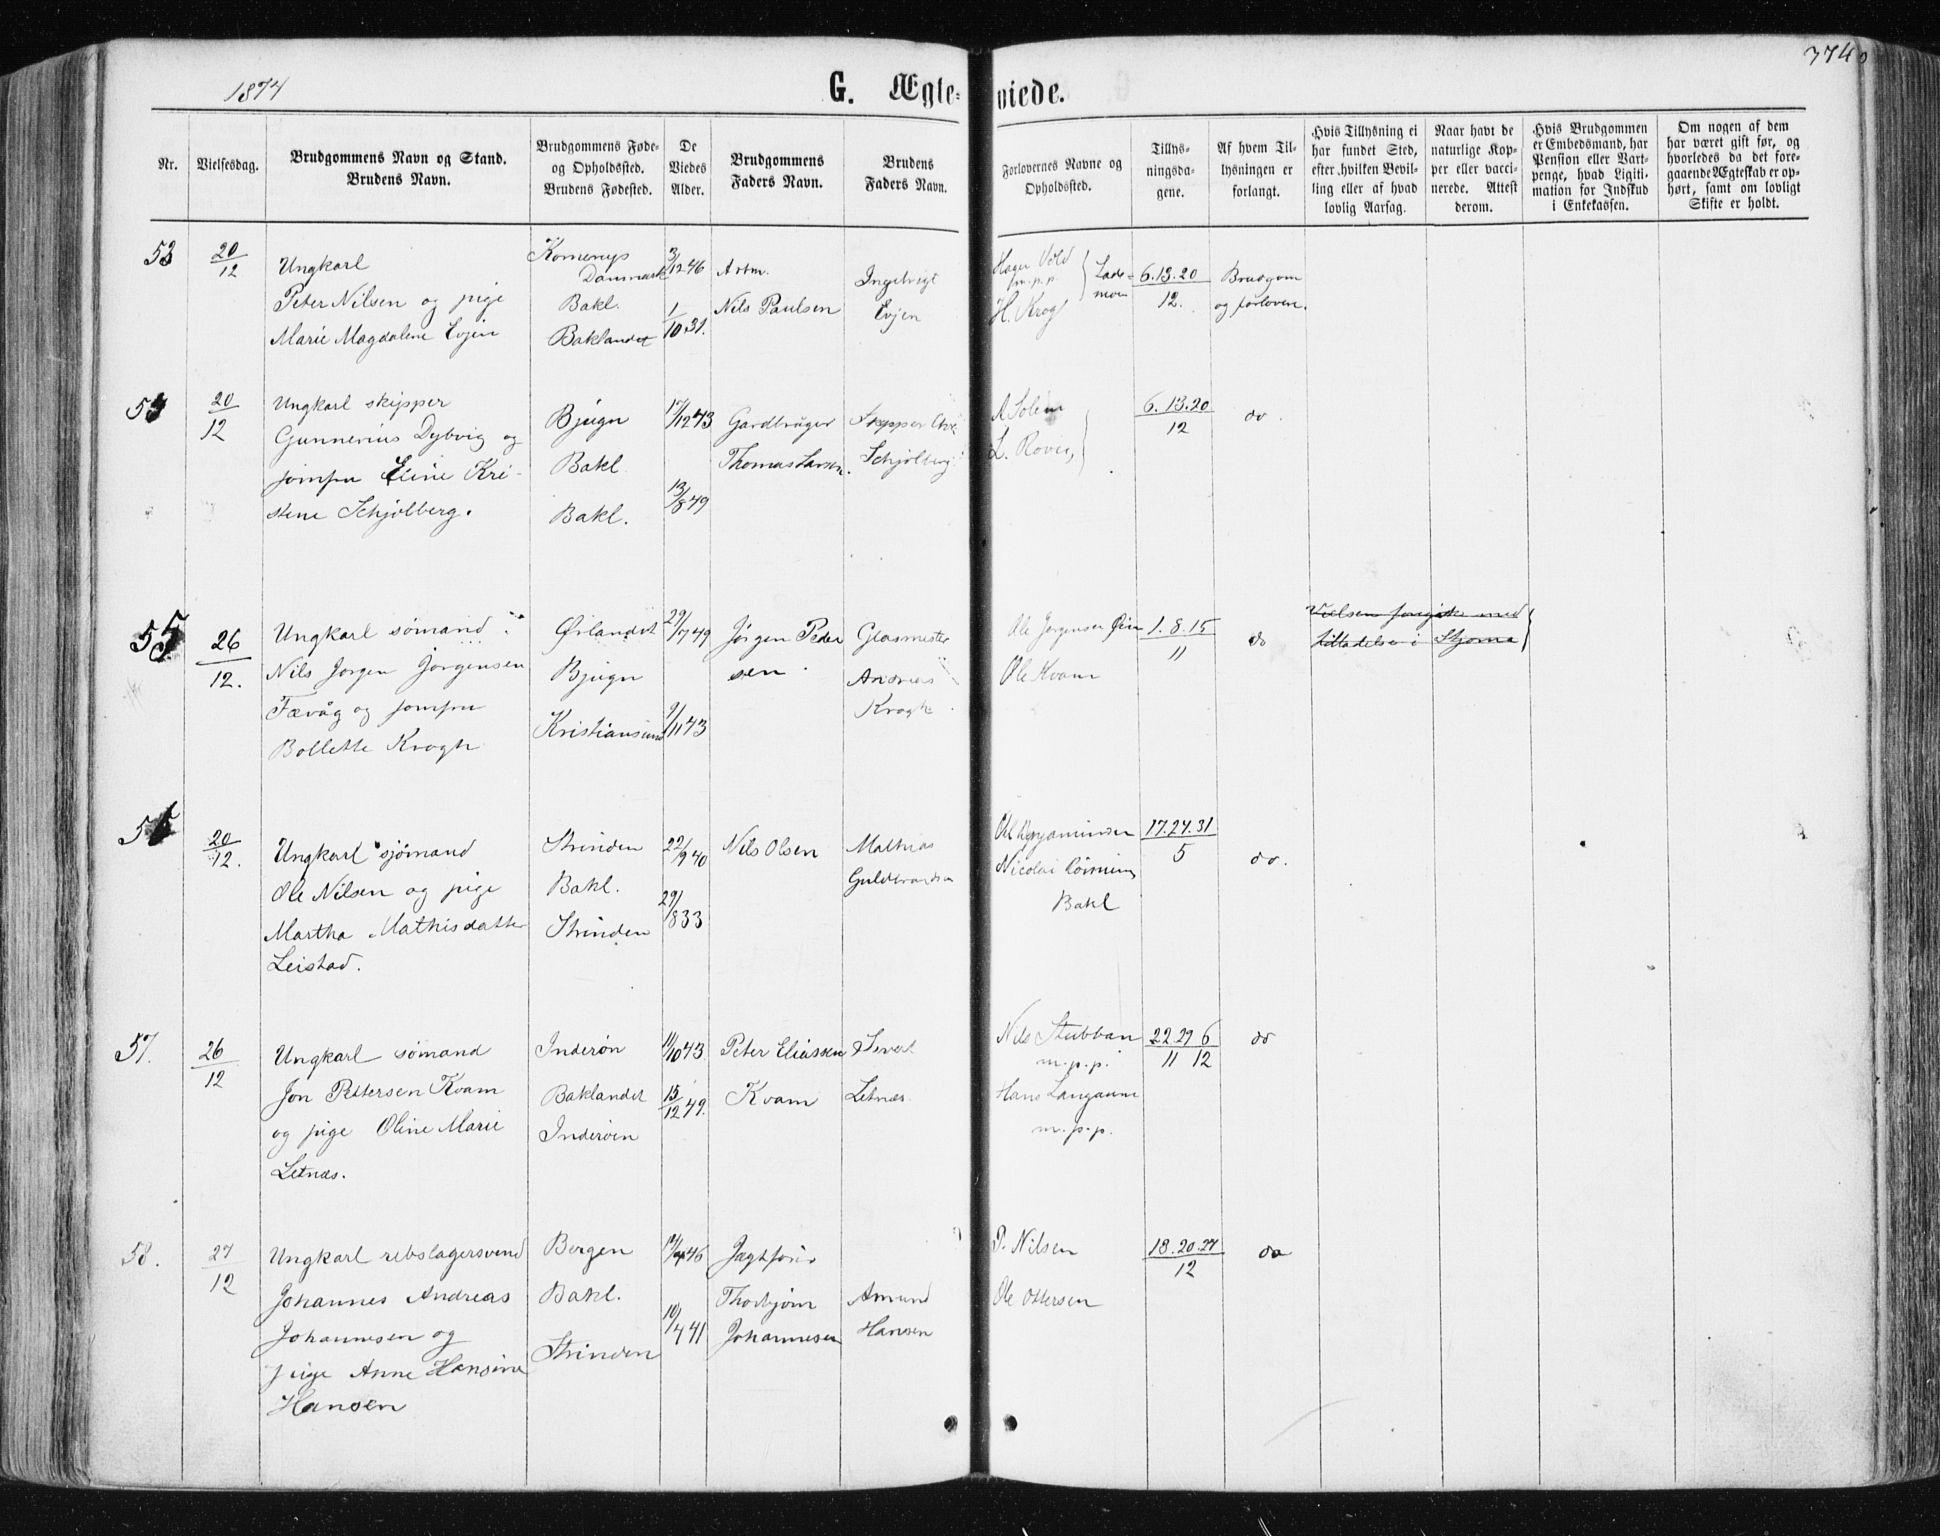 SAT, Ministerialprotokoller, klokkerbøker og fødselsregistre - Sør-Trøndelag, 604/L0186: Parish register (official) no. 604A07, 1866-1877, p. 374